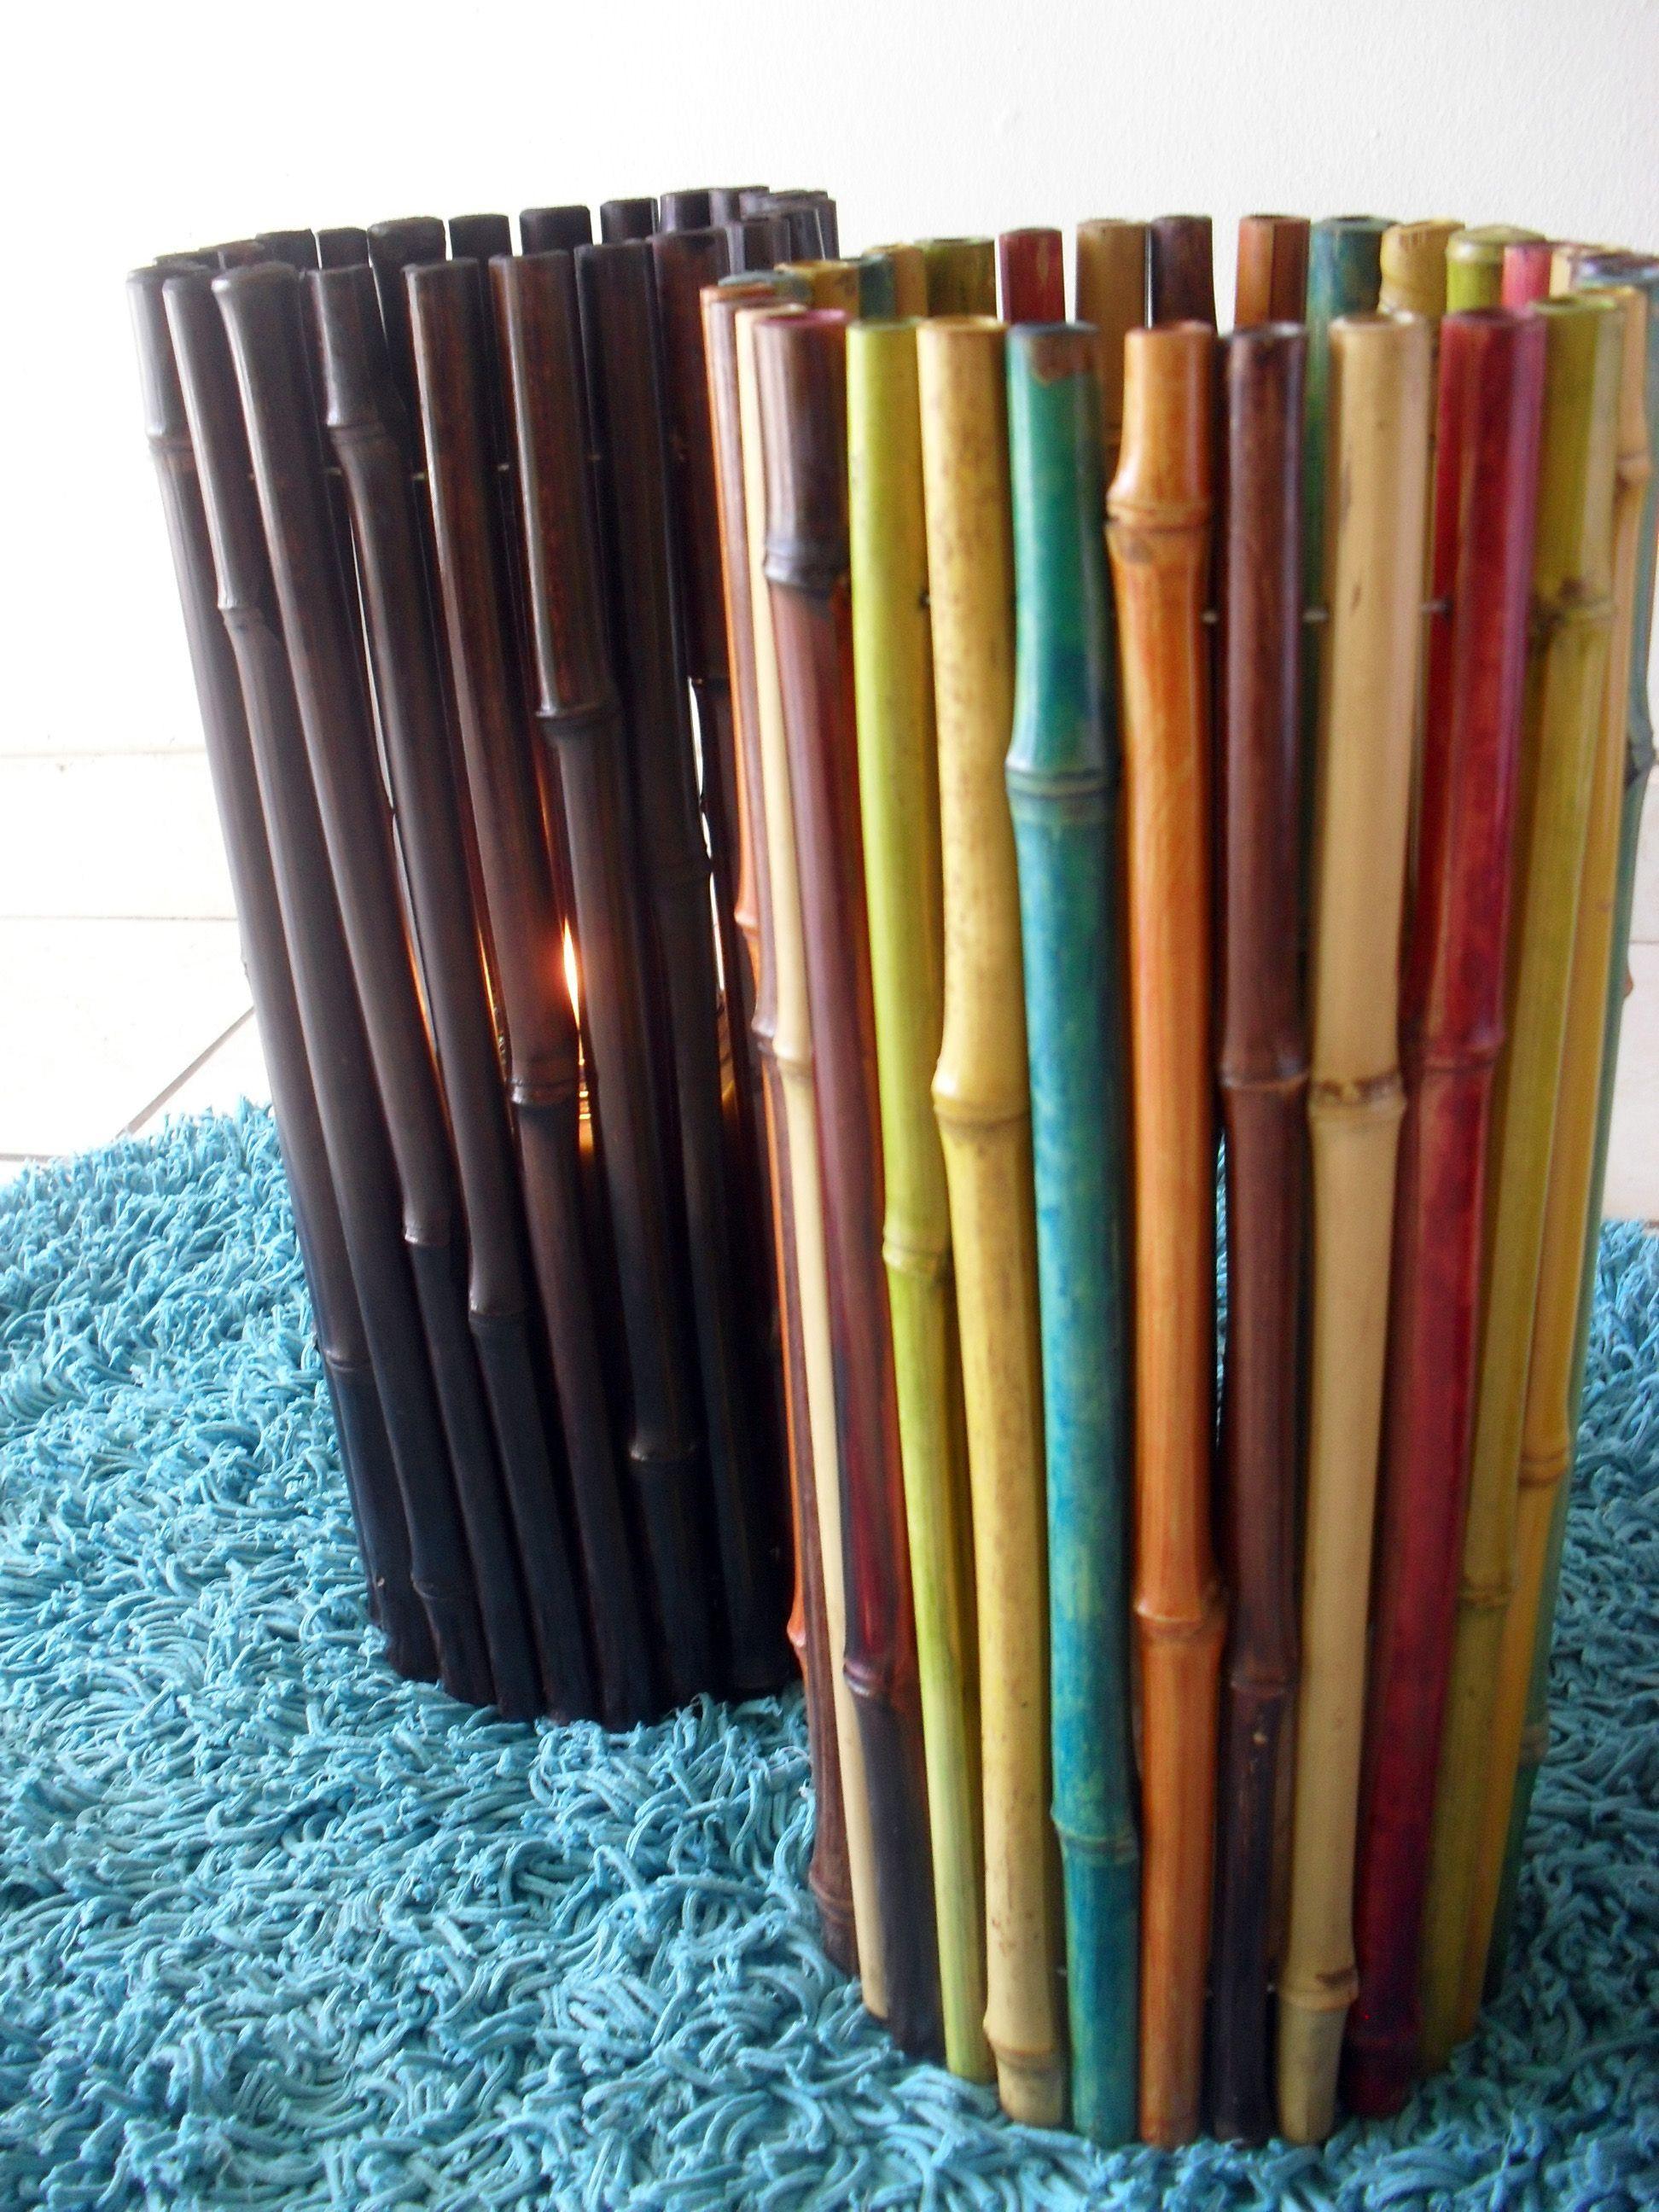 Bamboo Lamps With Images Bamboo Diy Bamboo Crafts Bamboo Lamp